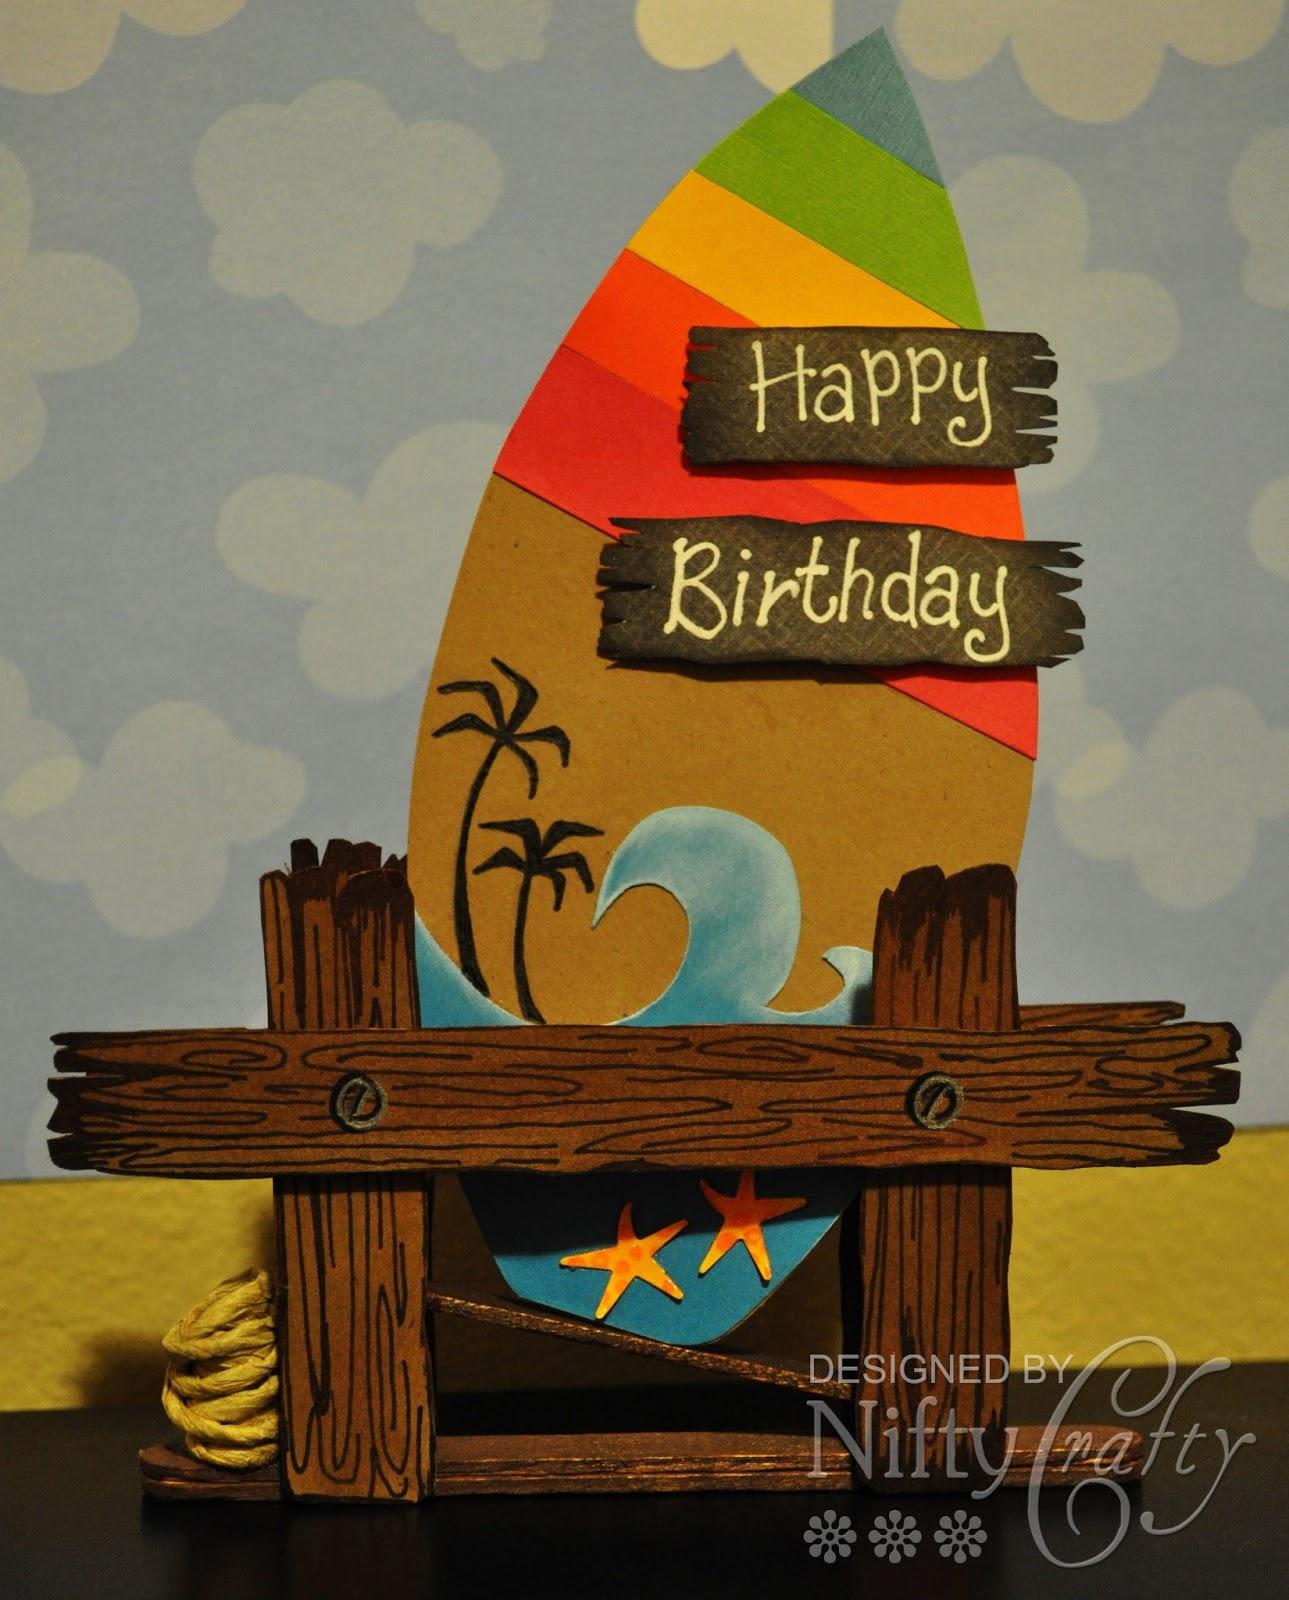 n i f t y c r a f t y Surf Board Birthday Card